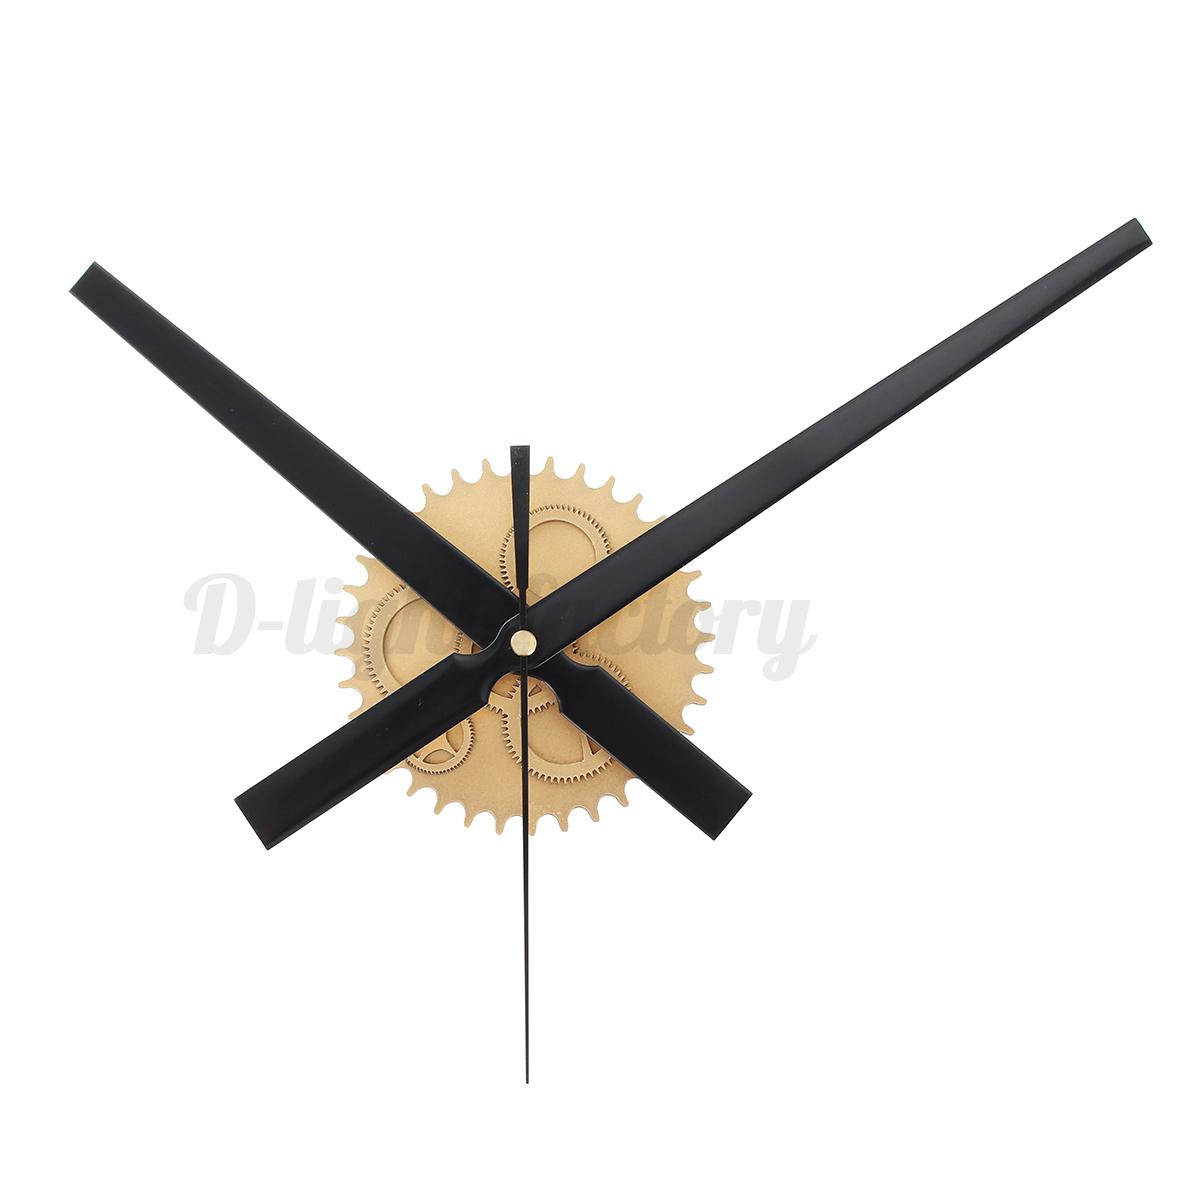 Diy Large Silent Quartz Wall Clock Movement Hands Mechanism Repair